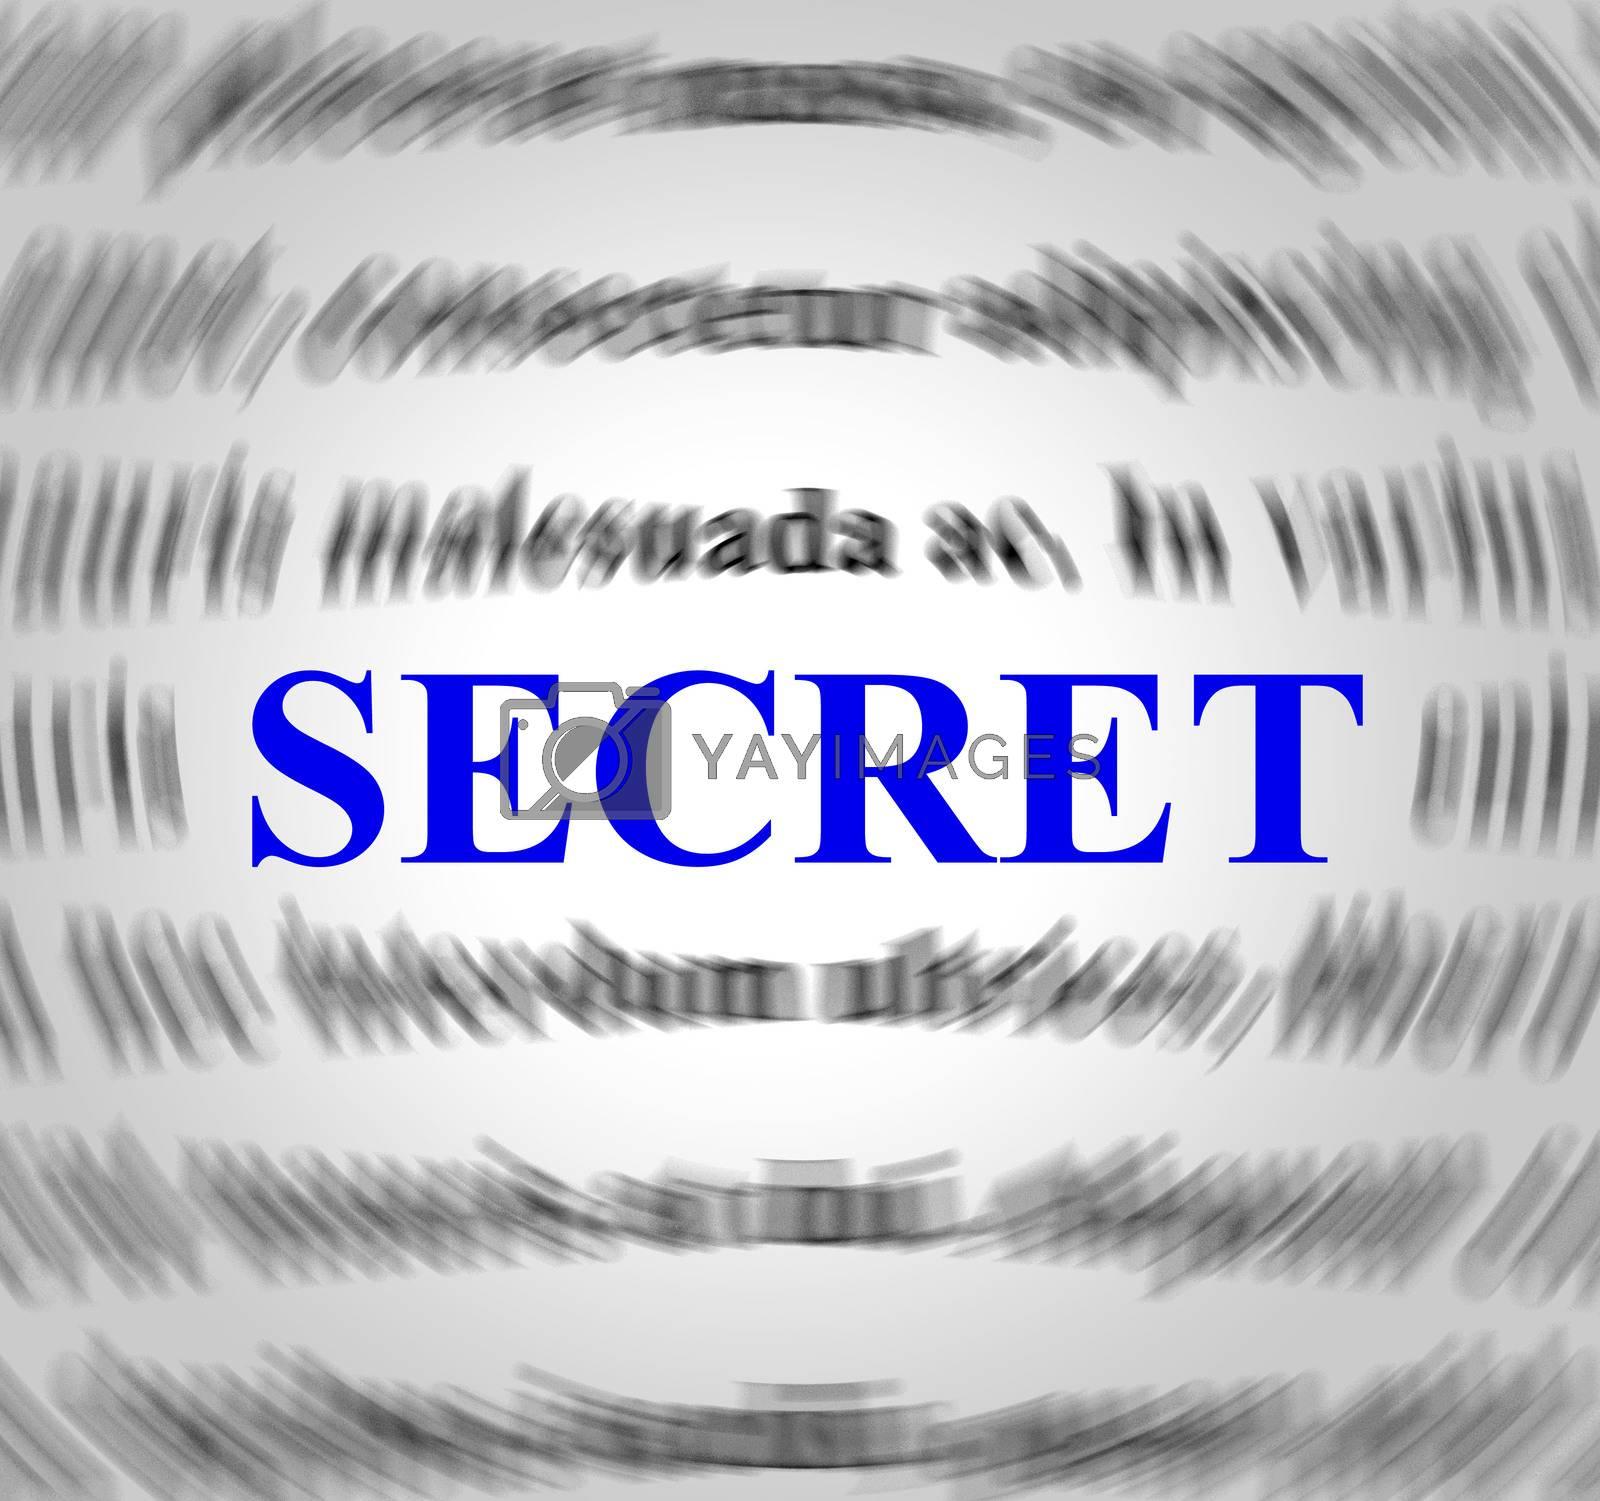 Secret Definition Indicates Hidden Secretly And Concealed by stuartmiles